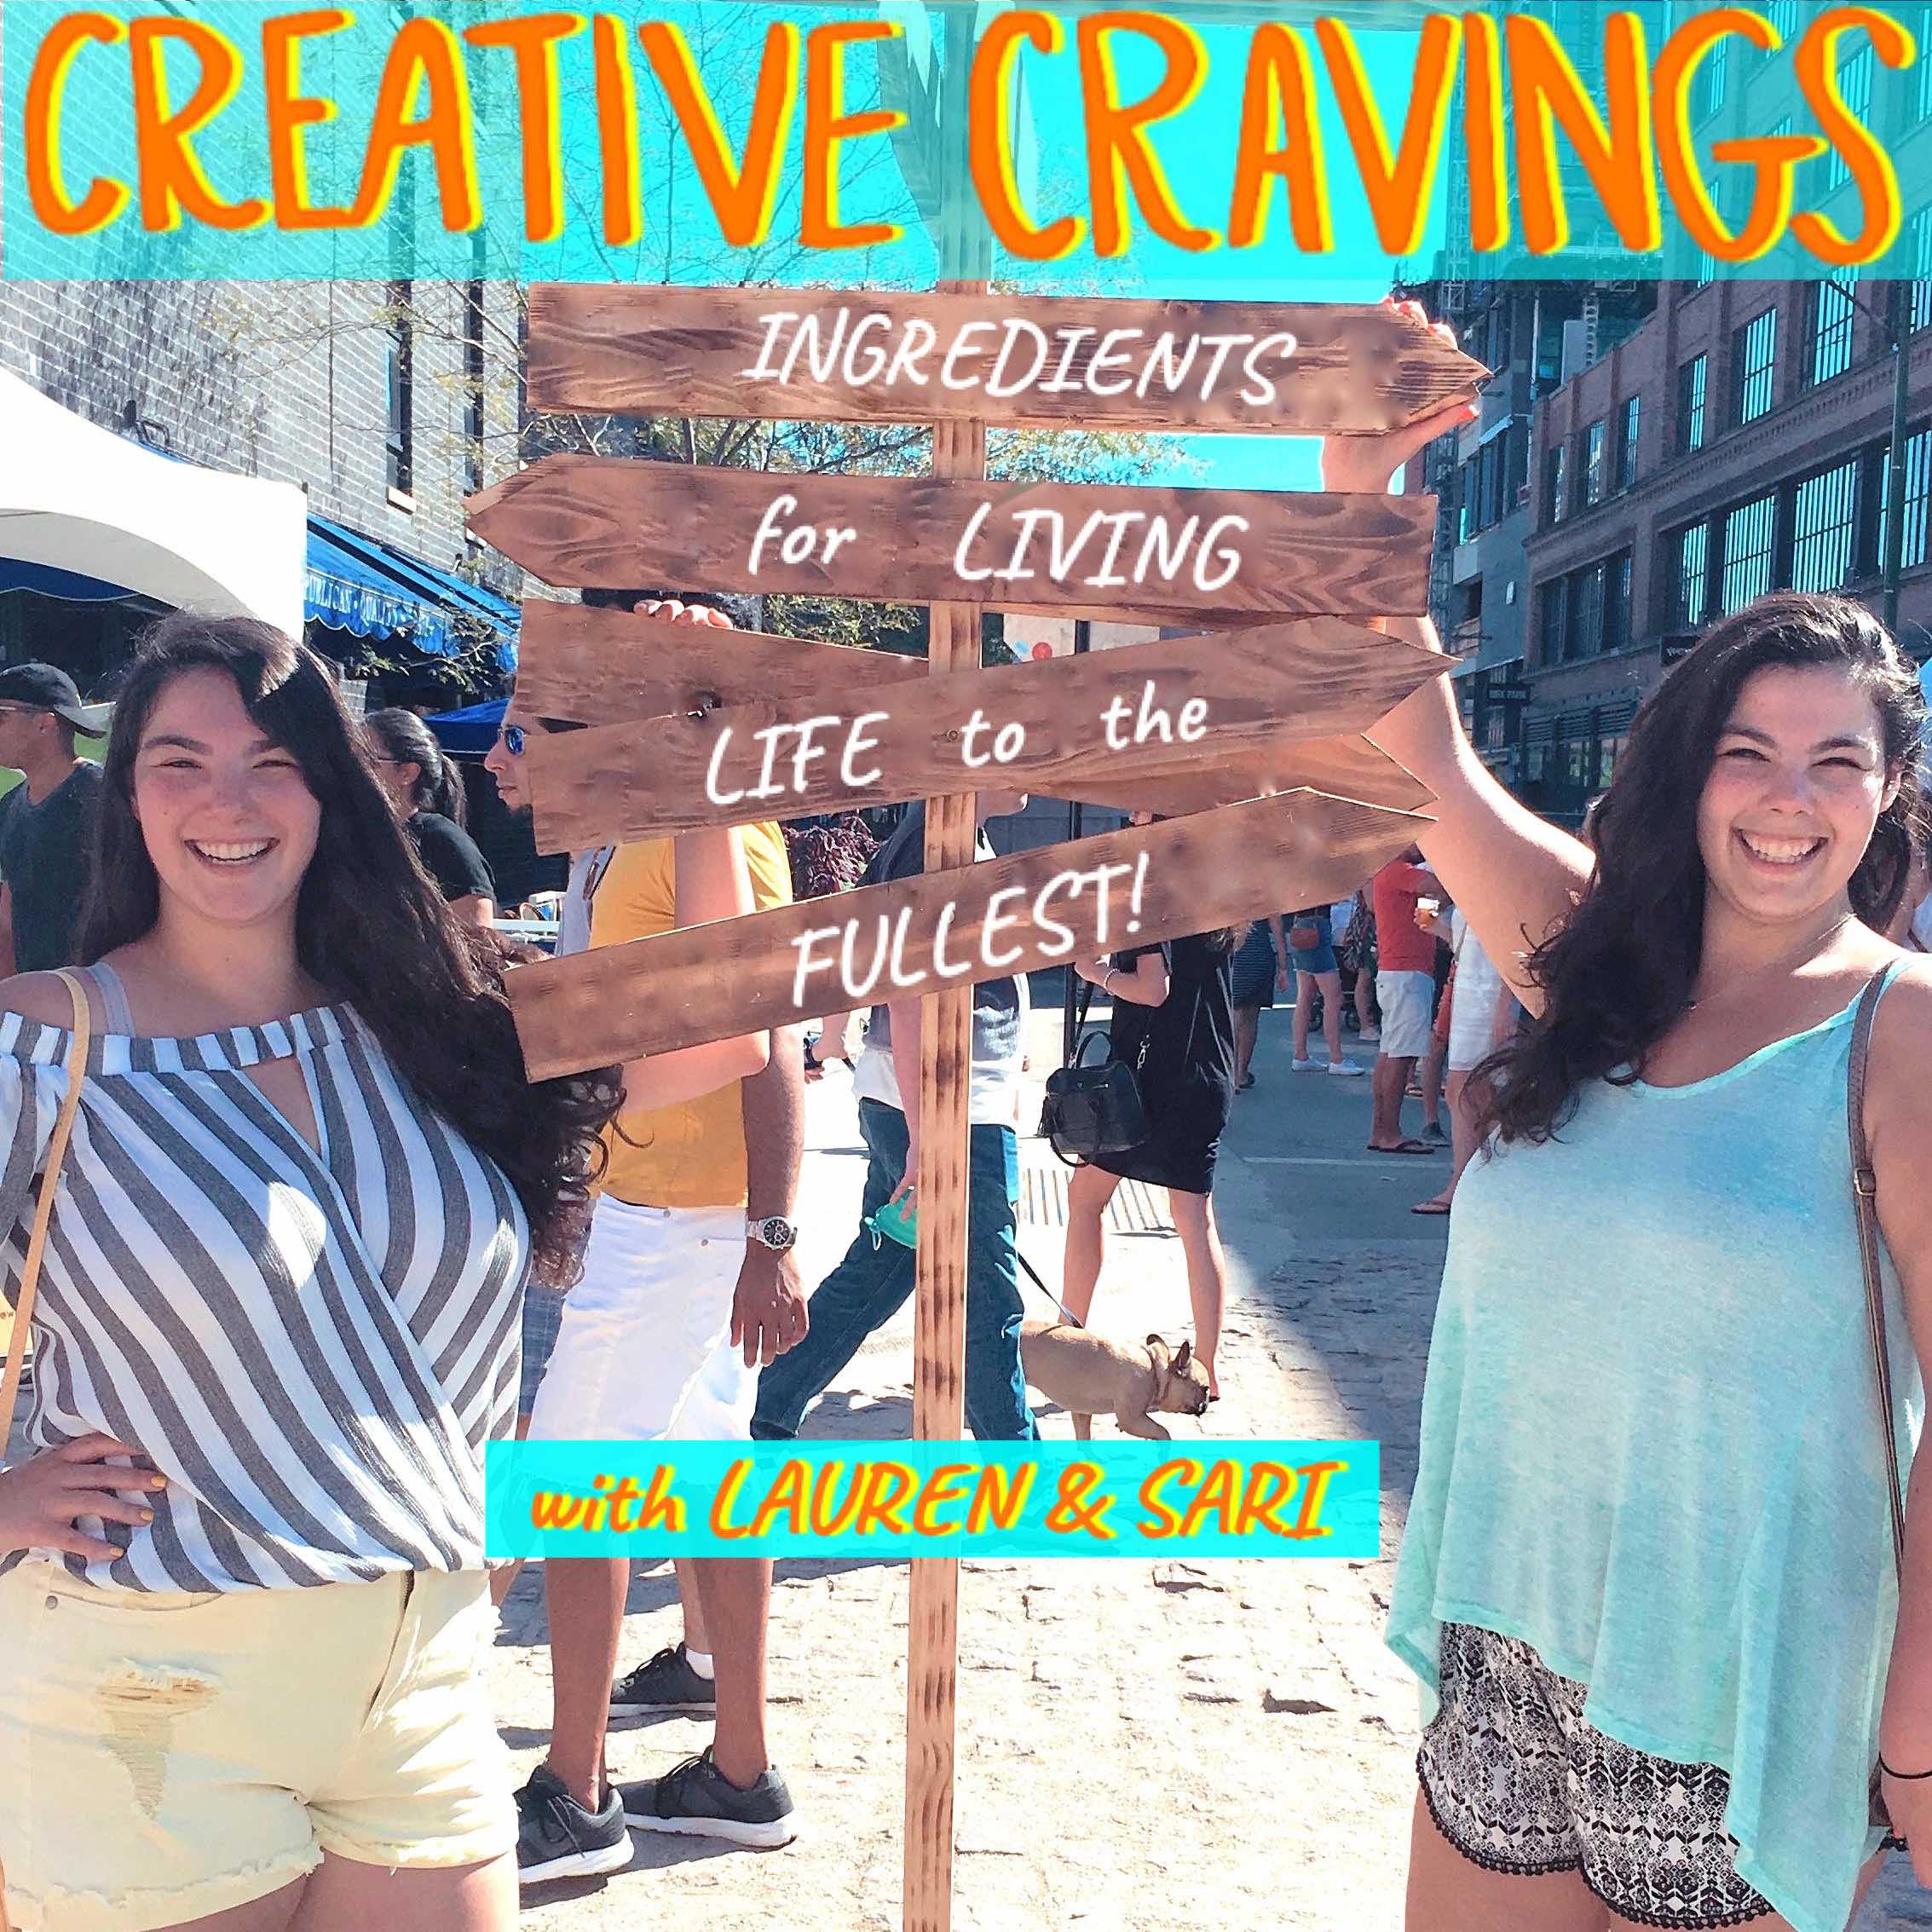 Ep 11: Let's Taco 'bout Joy, Gratitude, & Belonging   with Sari Feingold and Lauren Feingold @creative.cravings   5.6.19 (Cinco de Mayo!)